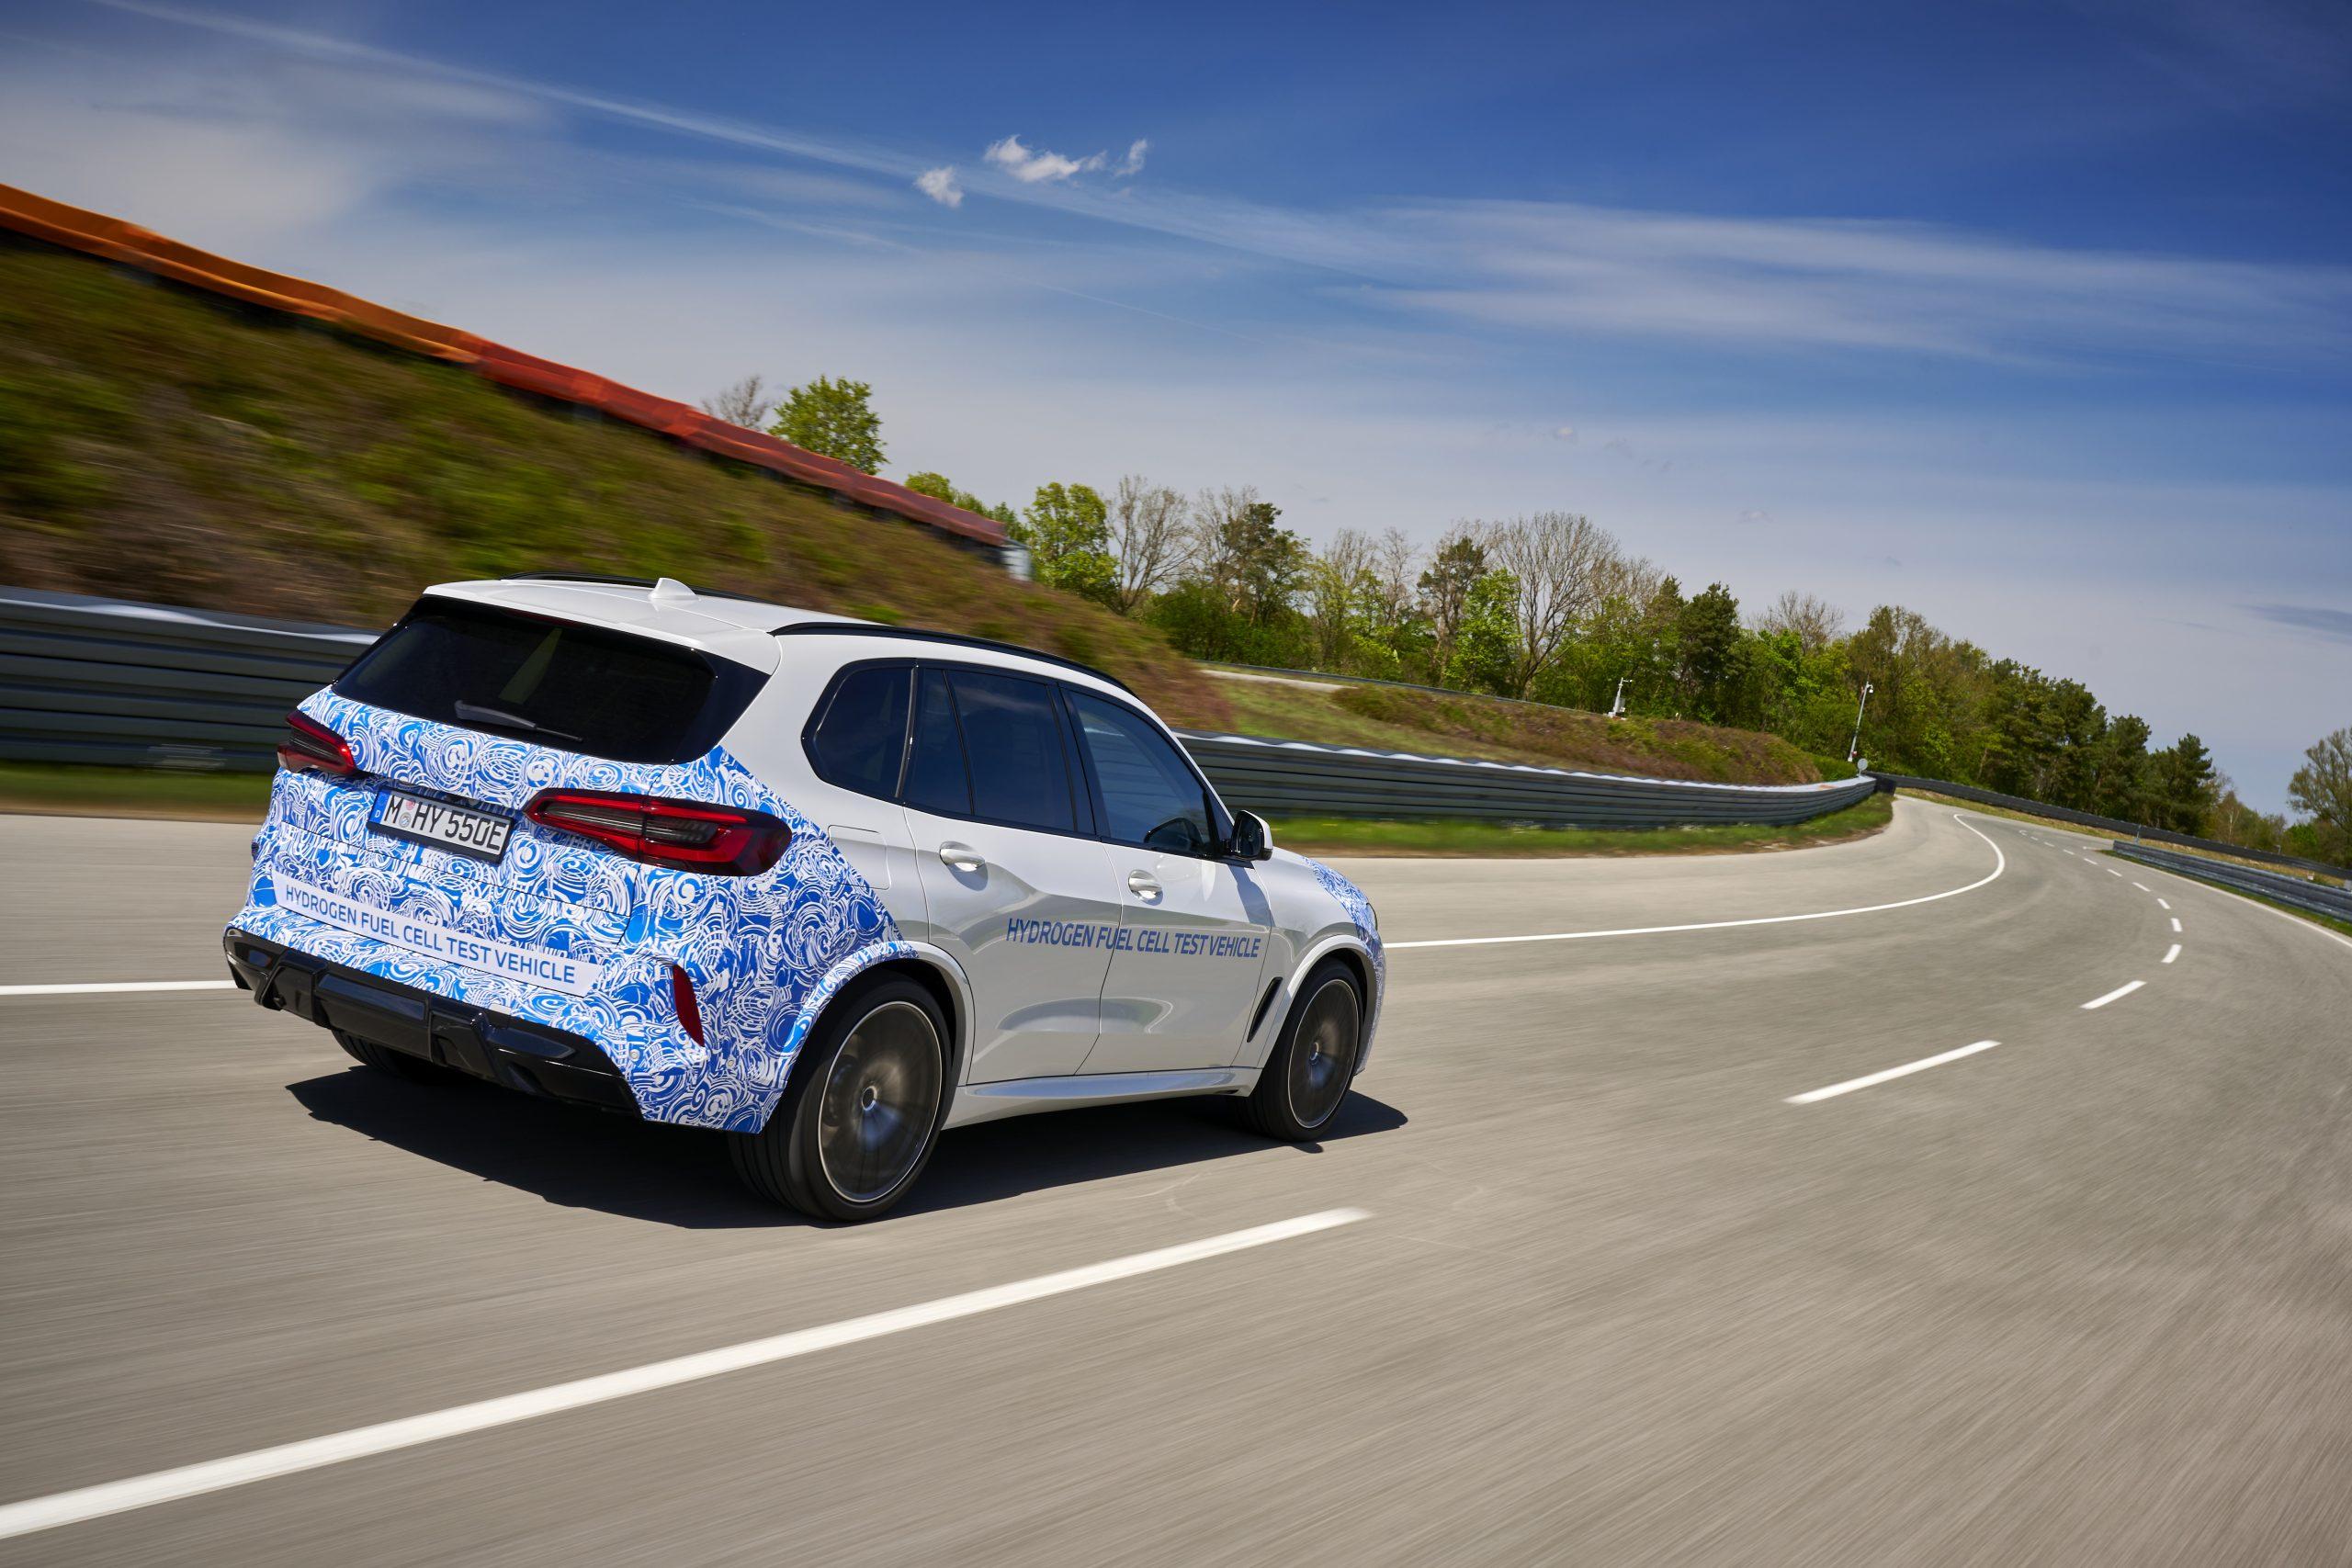 P90424565 highRes scaled Η BMW ξεκινά δοκιμές για μοντέλα κυψελών καυσίμου υδρογόνου BMW, zblog, ειδήσεις, Νέα, υδρογόνο